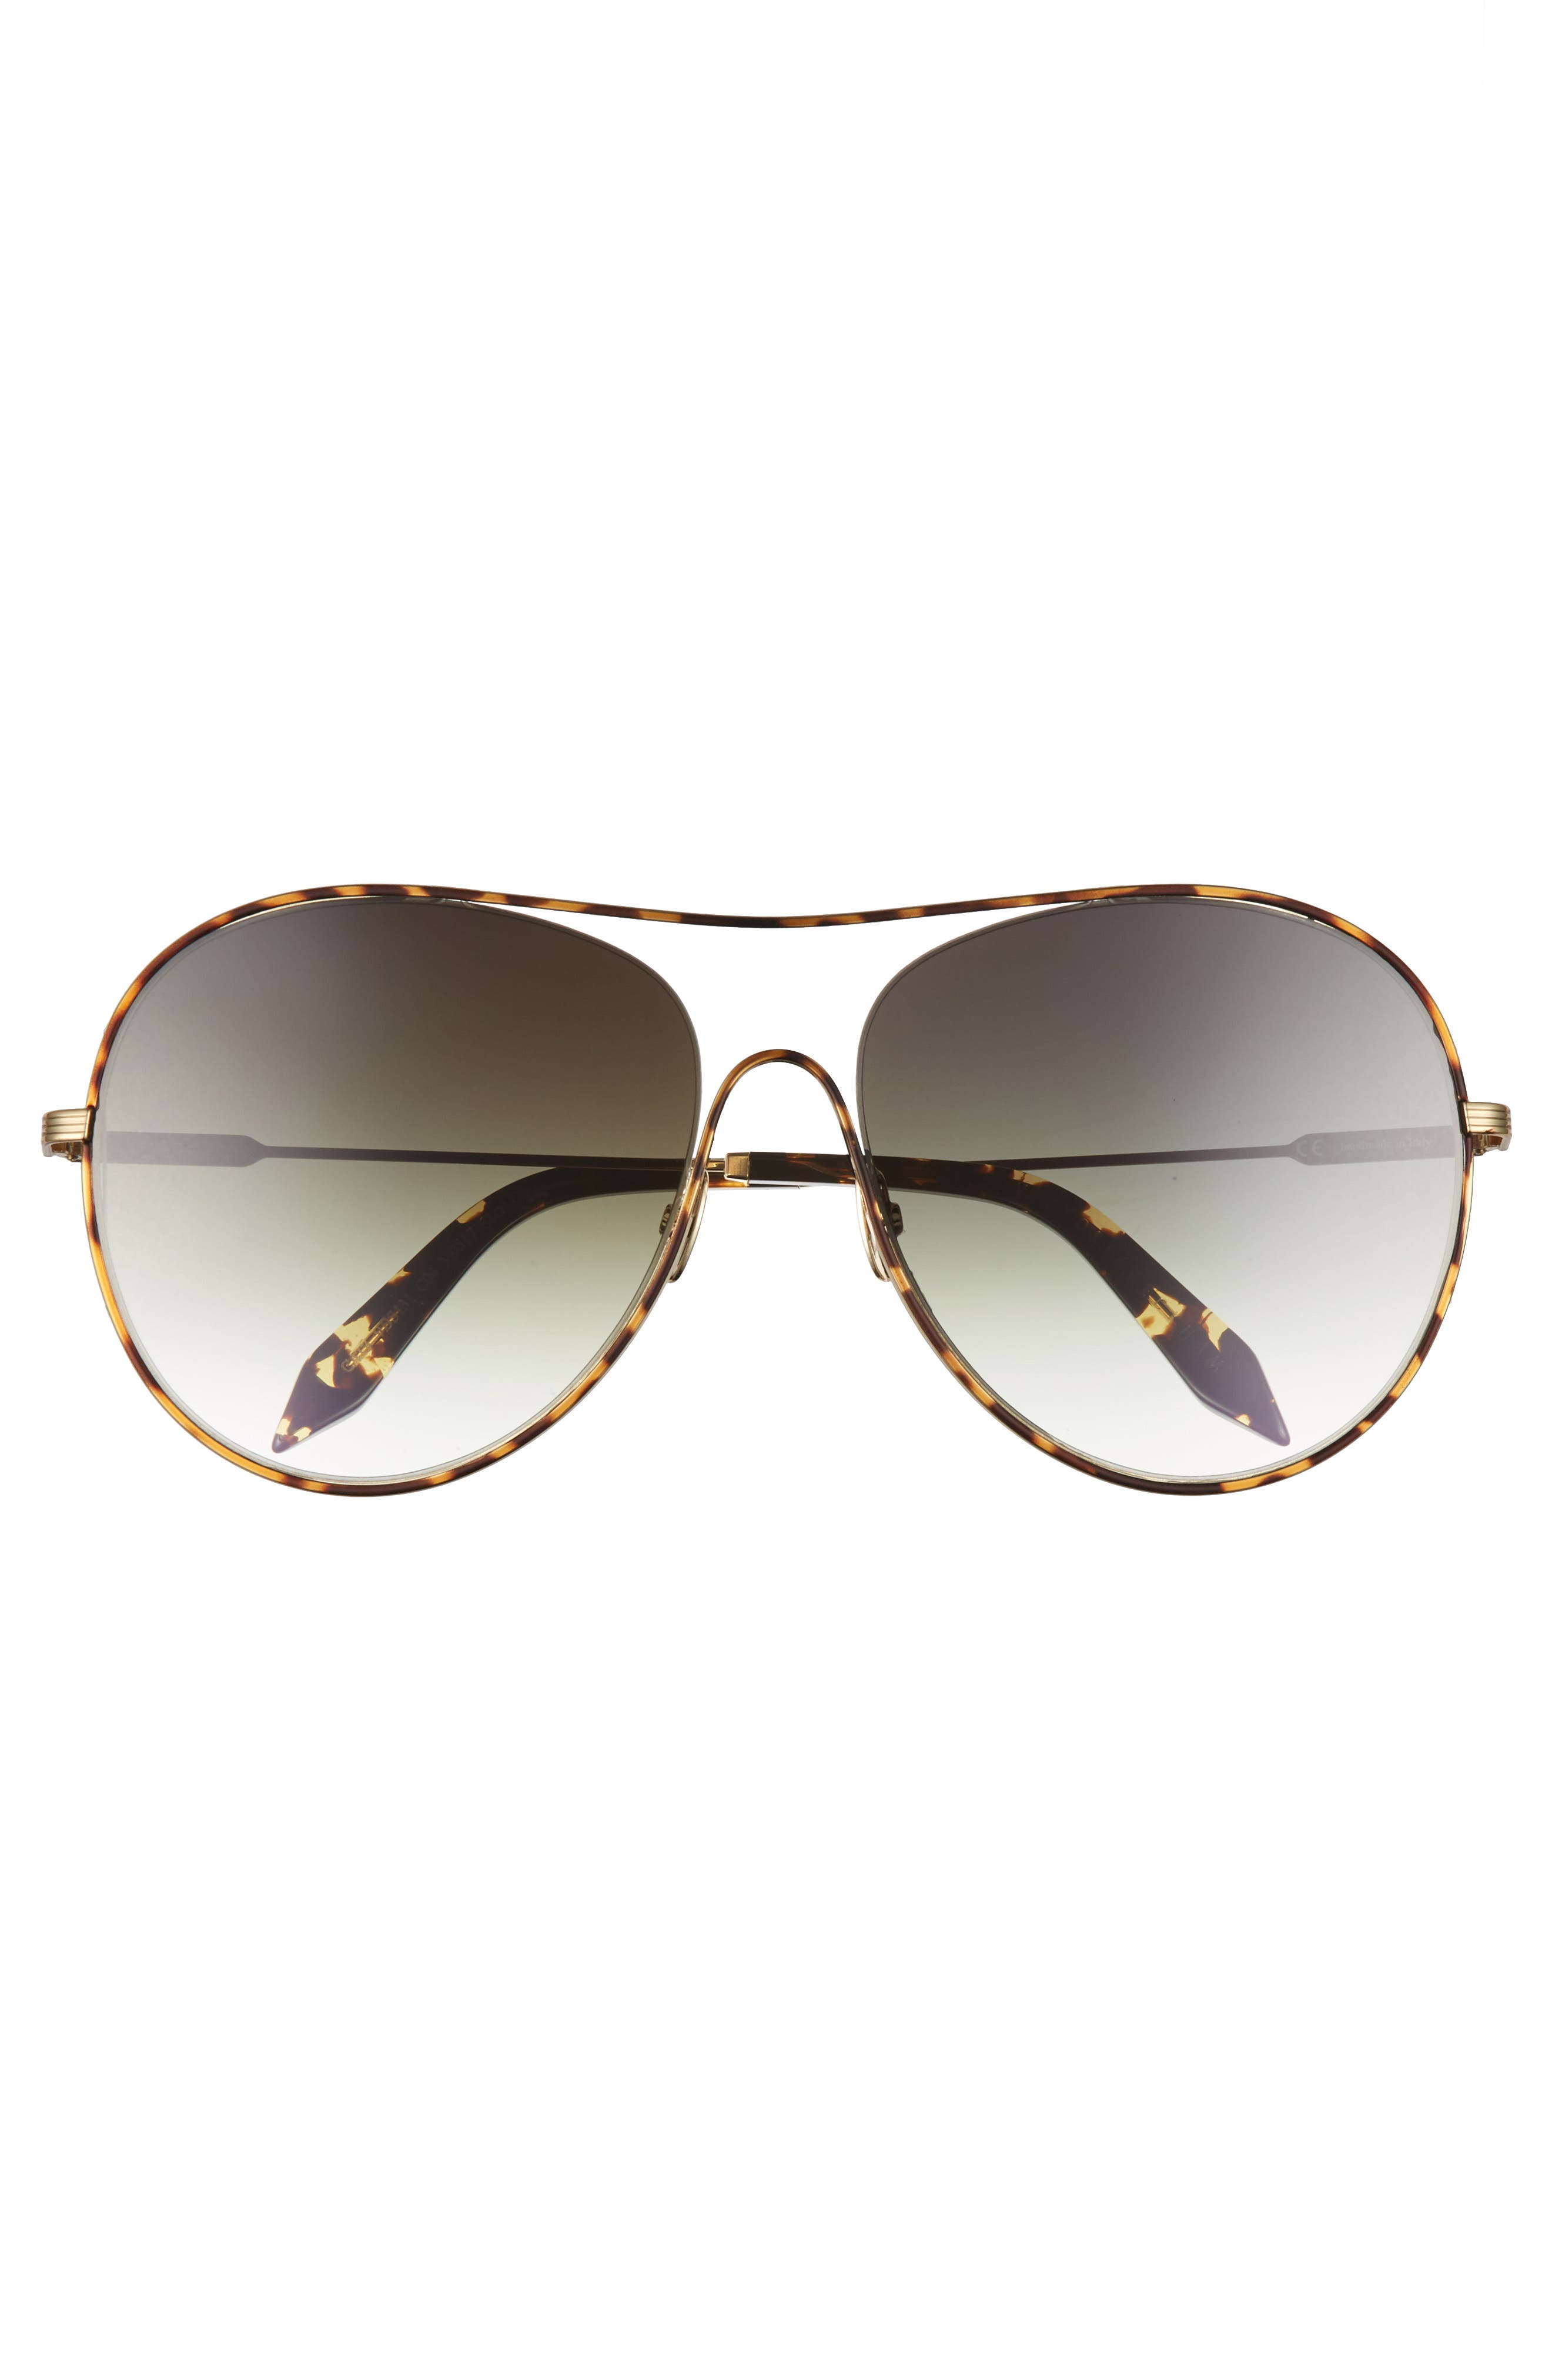 VICTORIA BECKHAM, Loop 63mm Oversize Round Sunglasses, Alternate thumbnail 3, color, AURORA